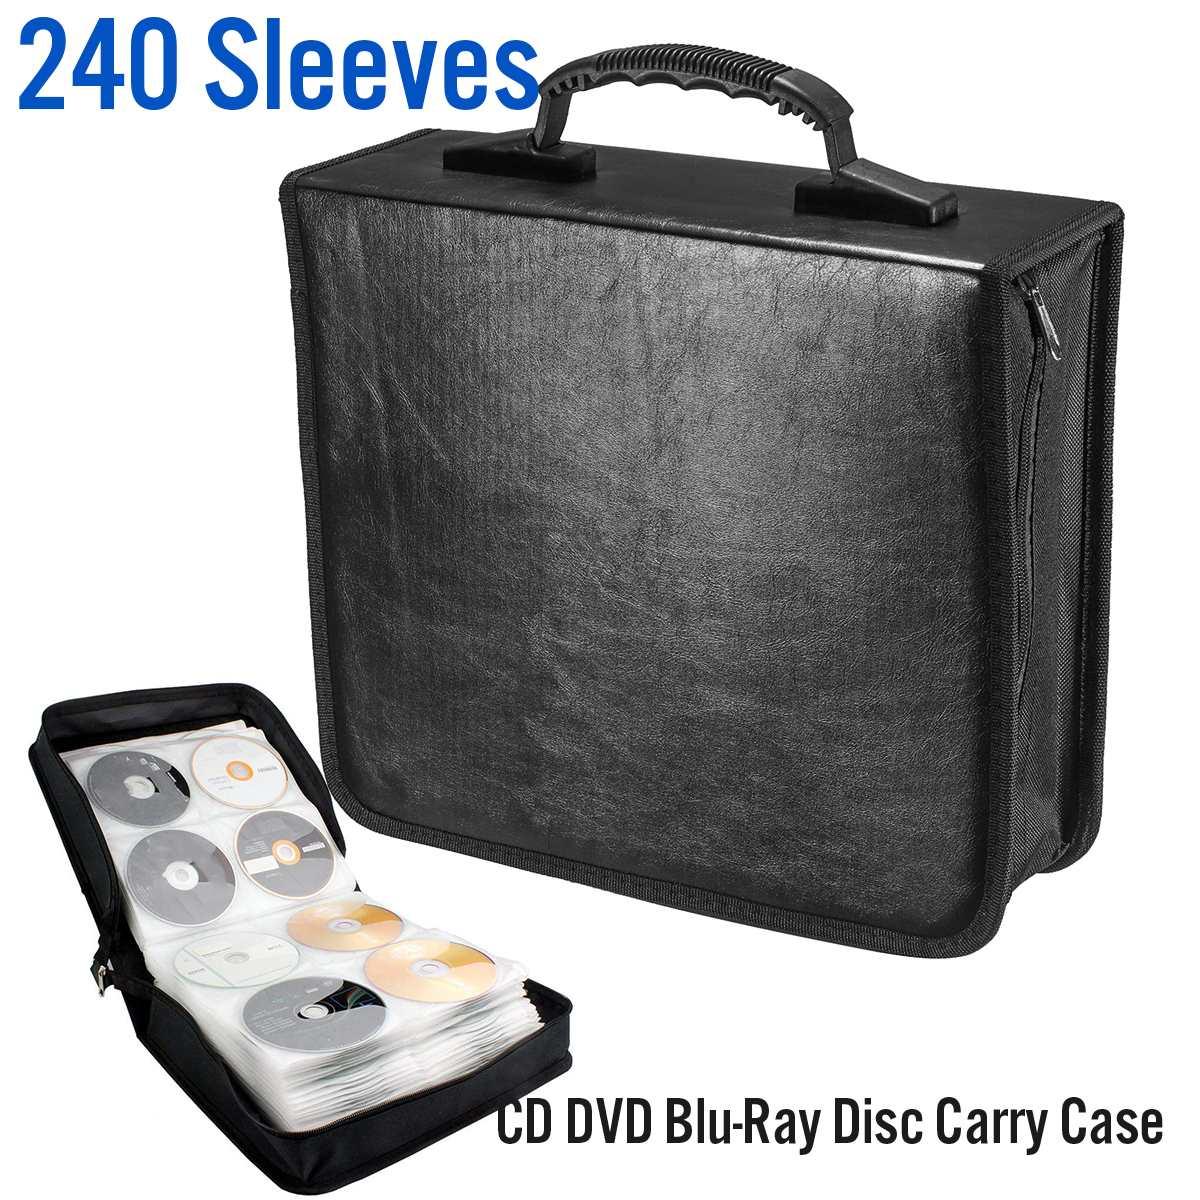 Disc CD DVD Case Storage Bag Album Collection Holder Box Carrying Organizer Disc Blu-Ray DJ Storage Wallets PU Leather 240pcs